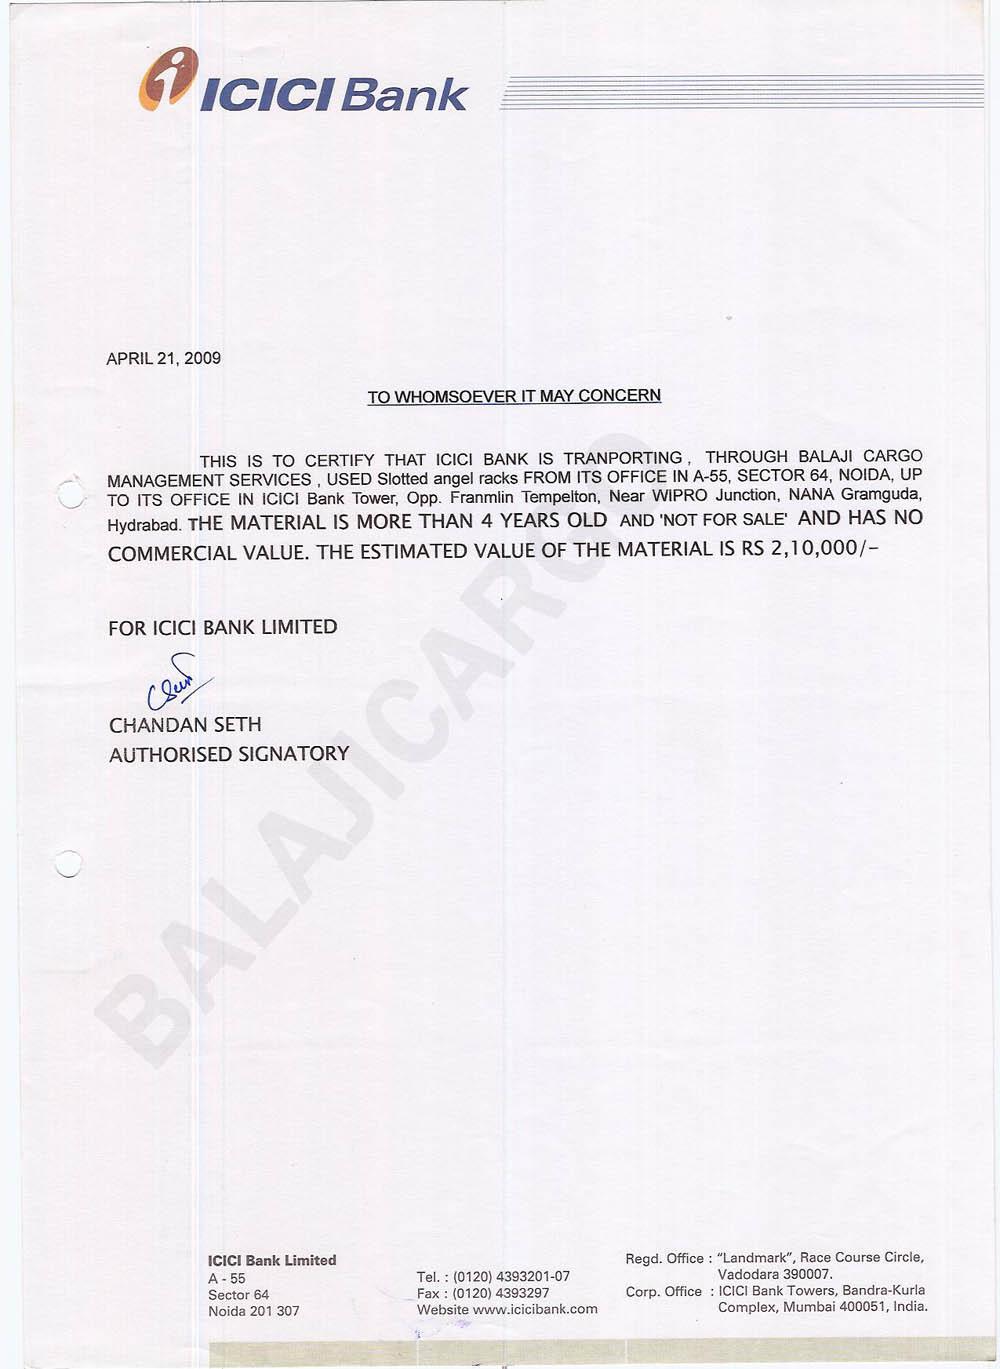 Complaint Letter Format Icici Bank.  Complaint Letter Format Icici Bank Balaji Trans Carriers Clients Testimonials Sles From Sle complaint letter format icici bank 28 images pune home